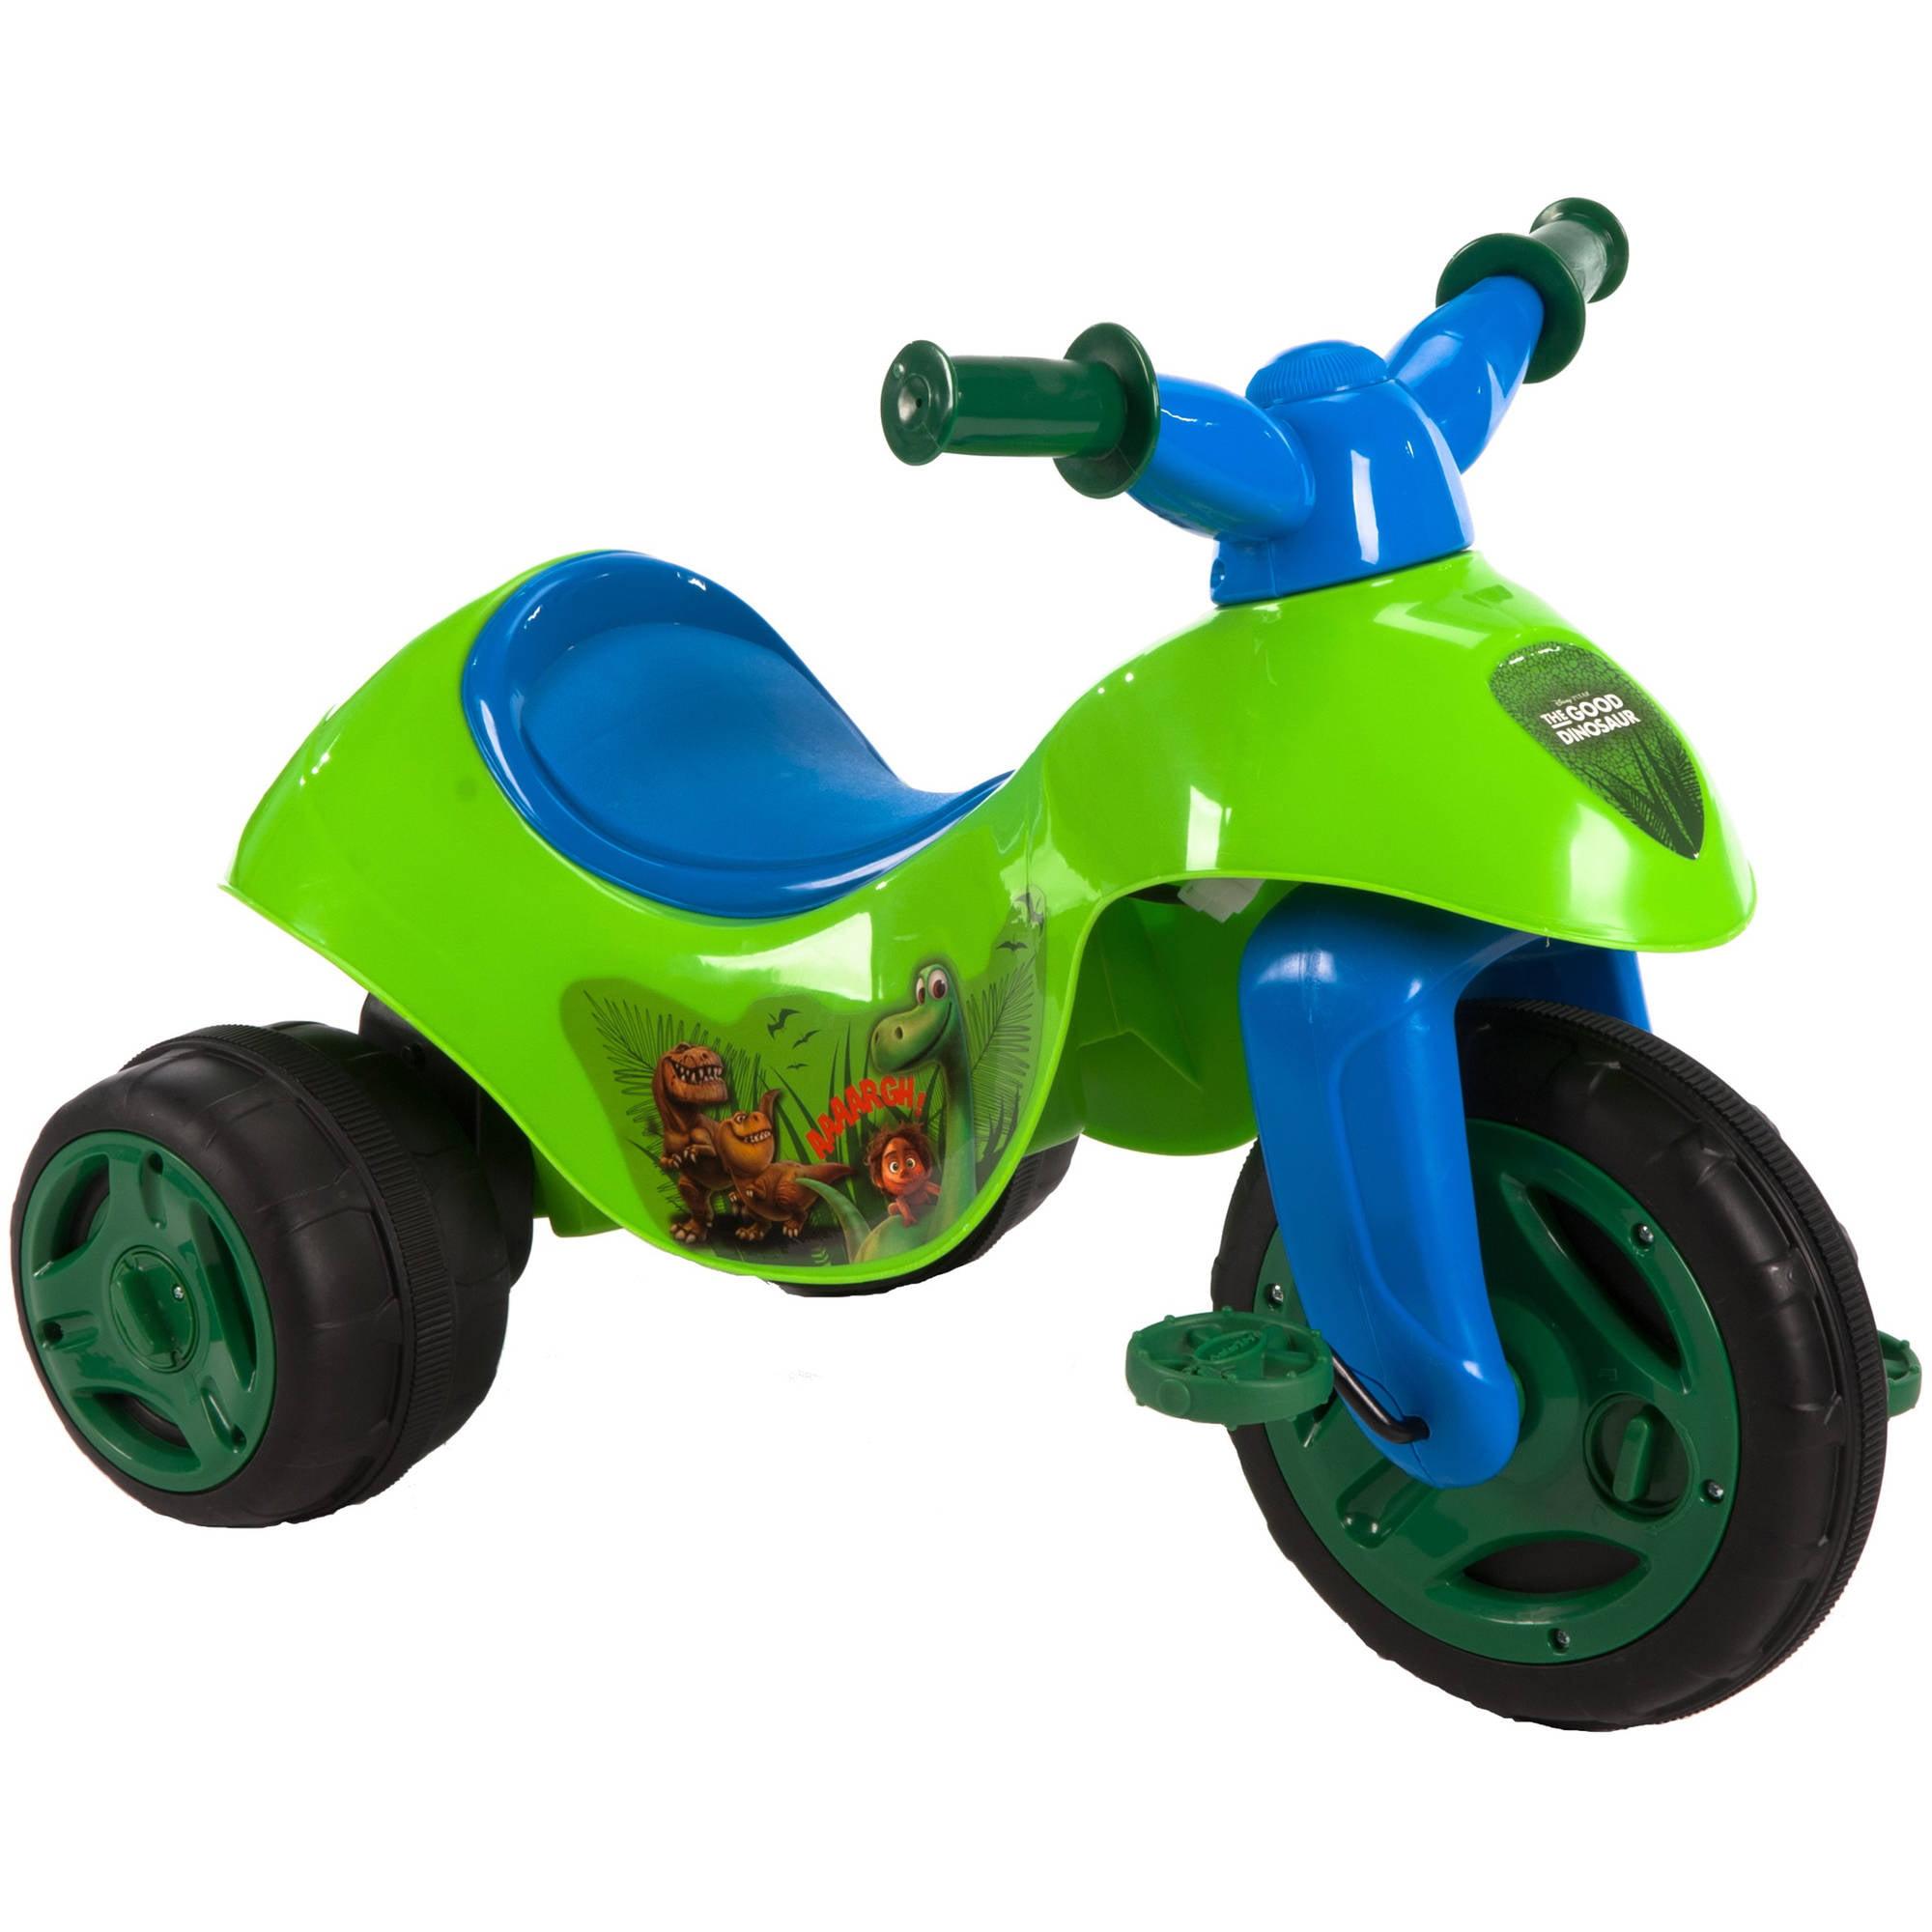 Huffy Disney The Good Dinosaur 6V Dual Power Tricycle Walmart